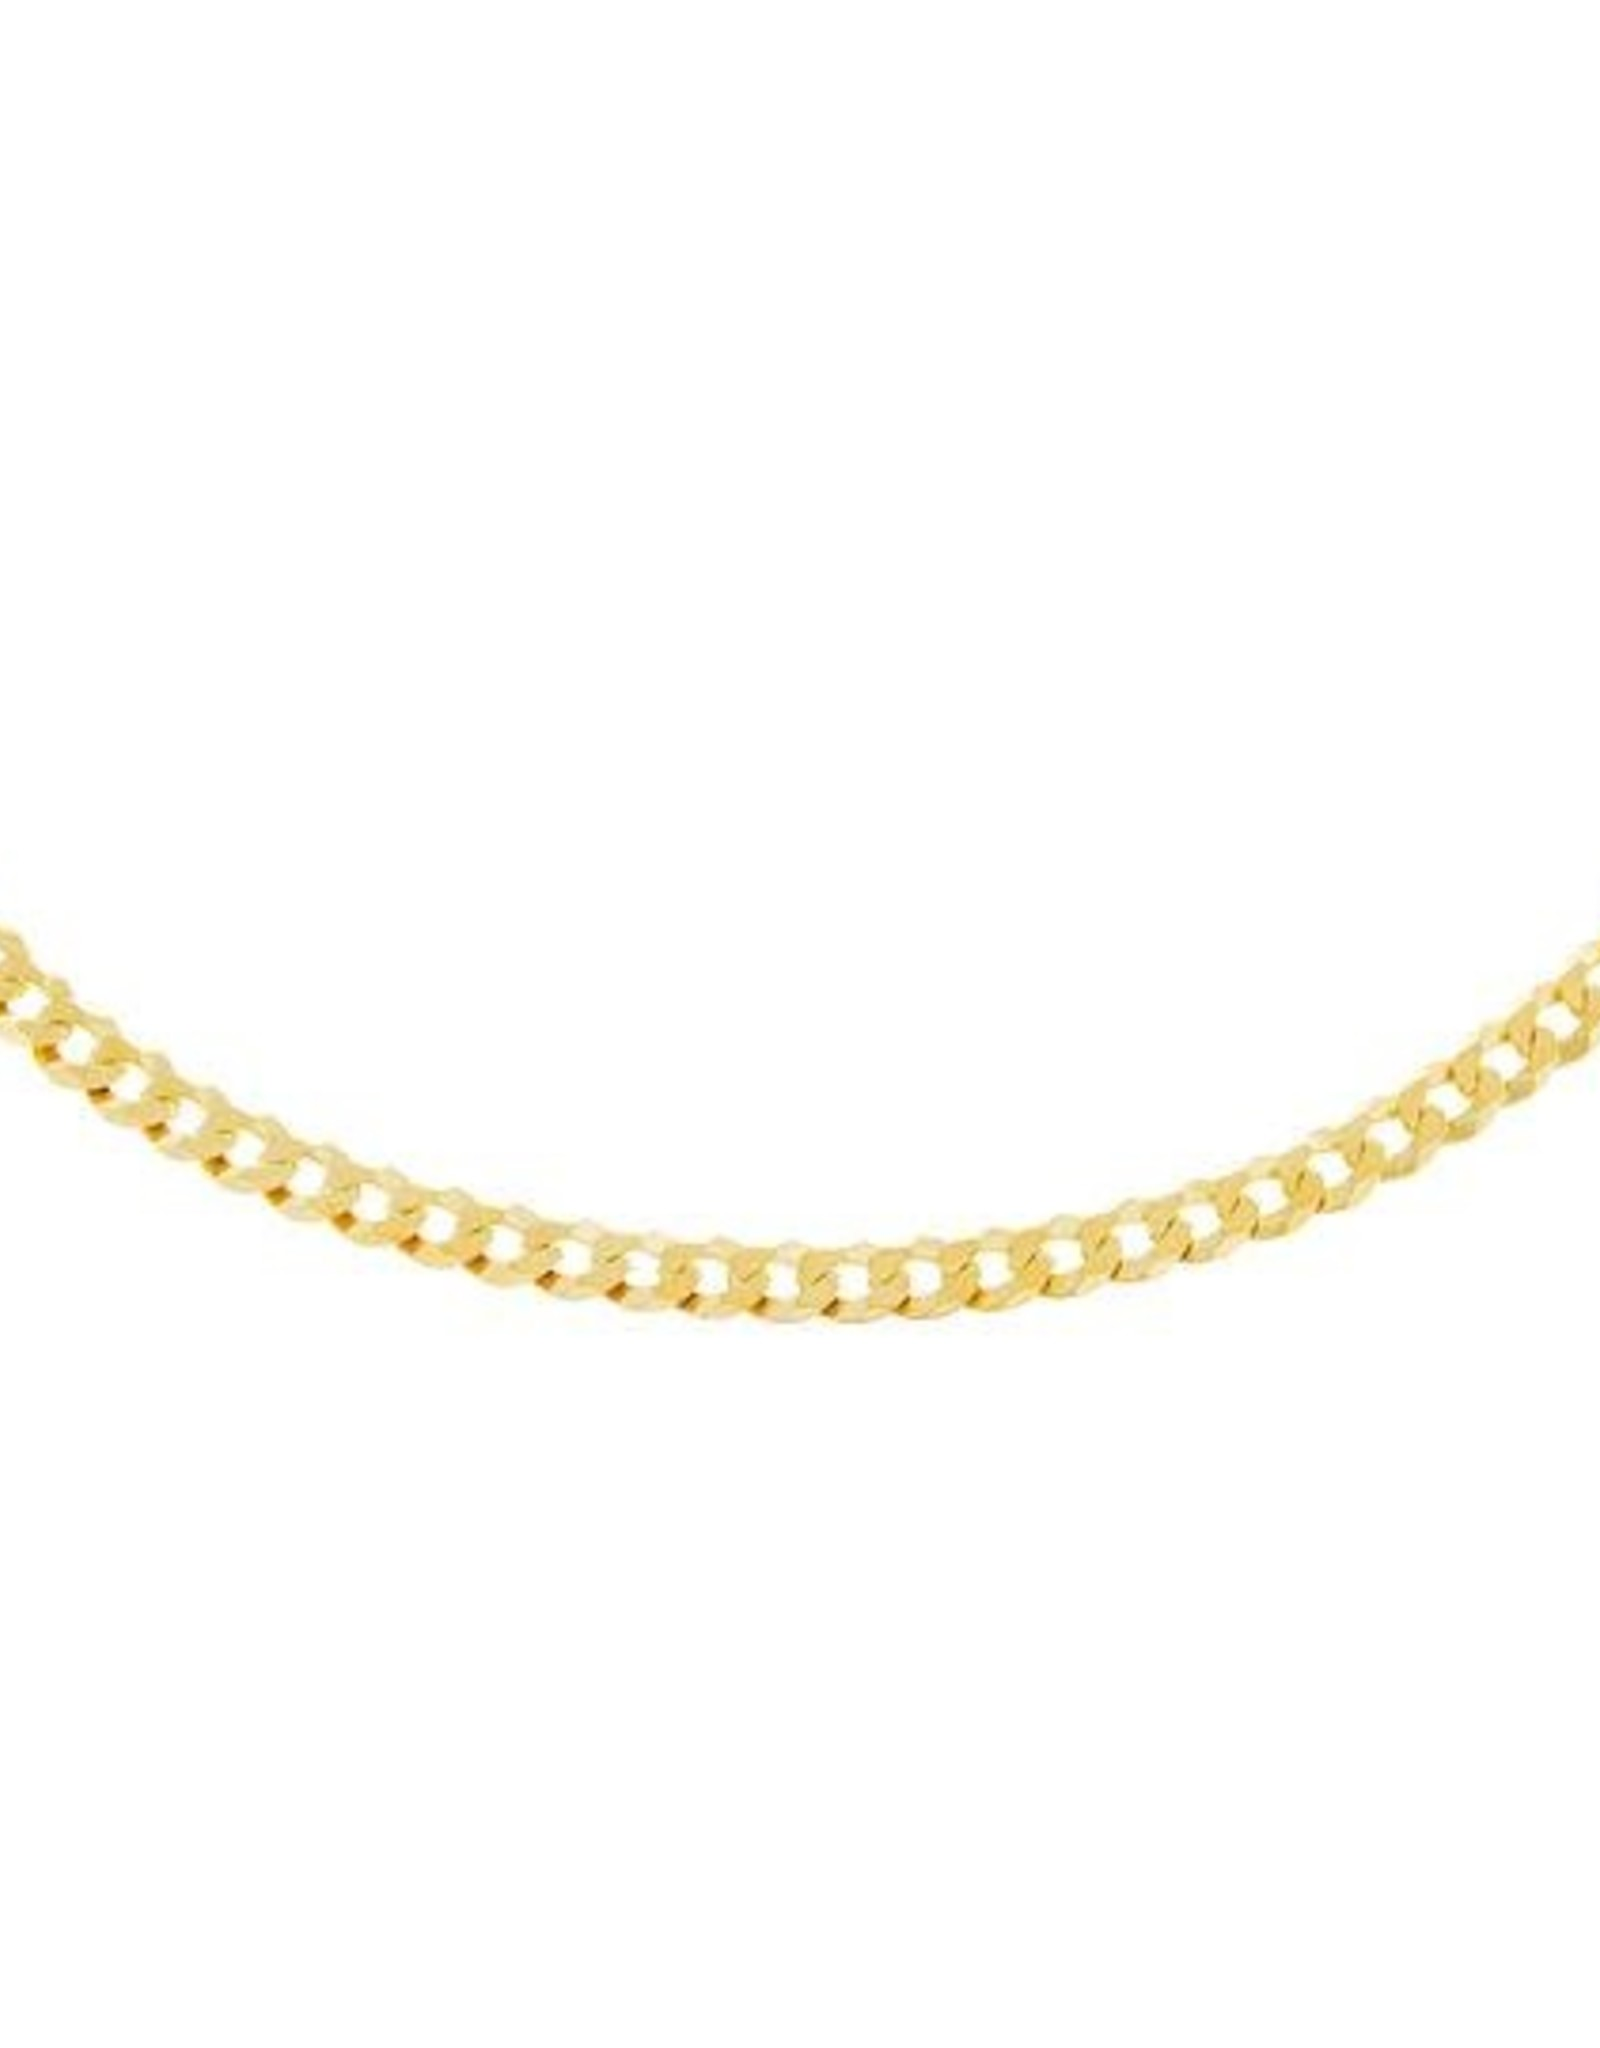 Adinas Extra Flat Cuban Chain Necklace